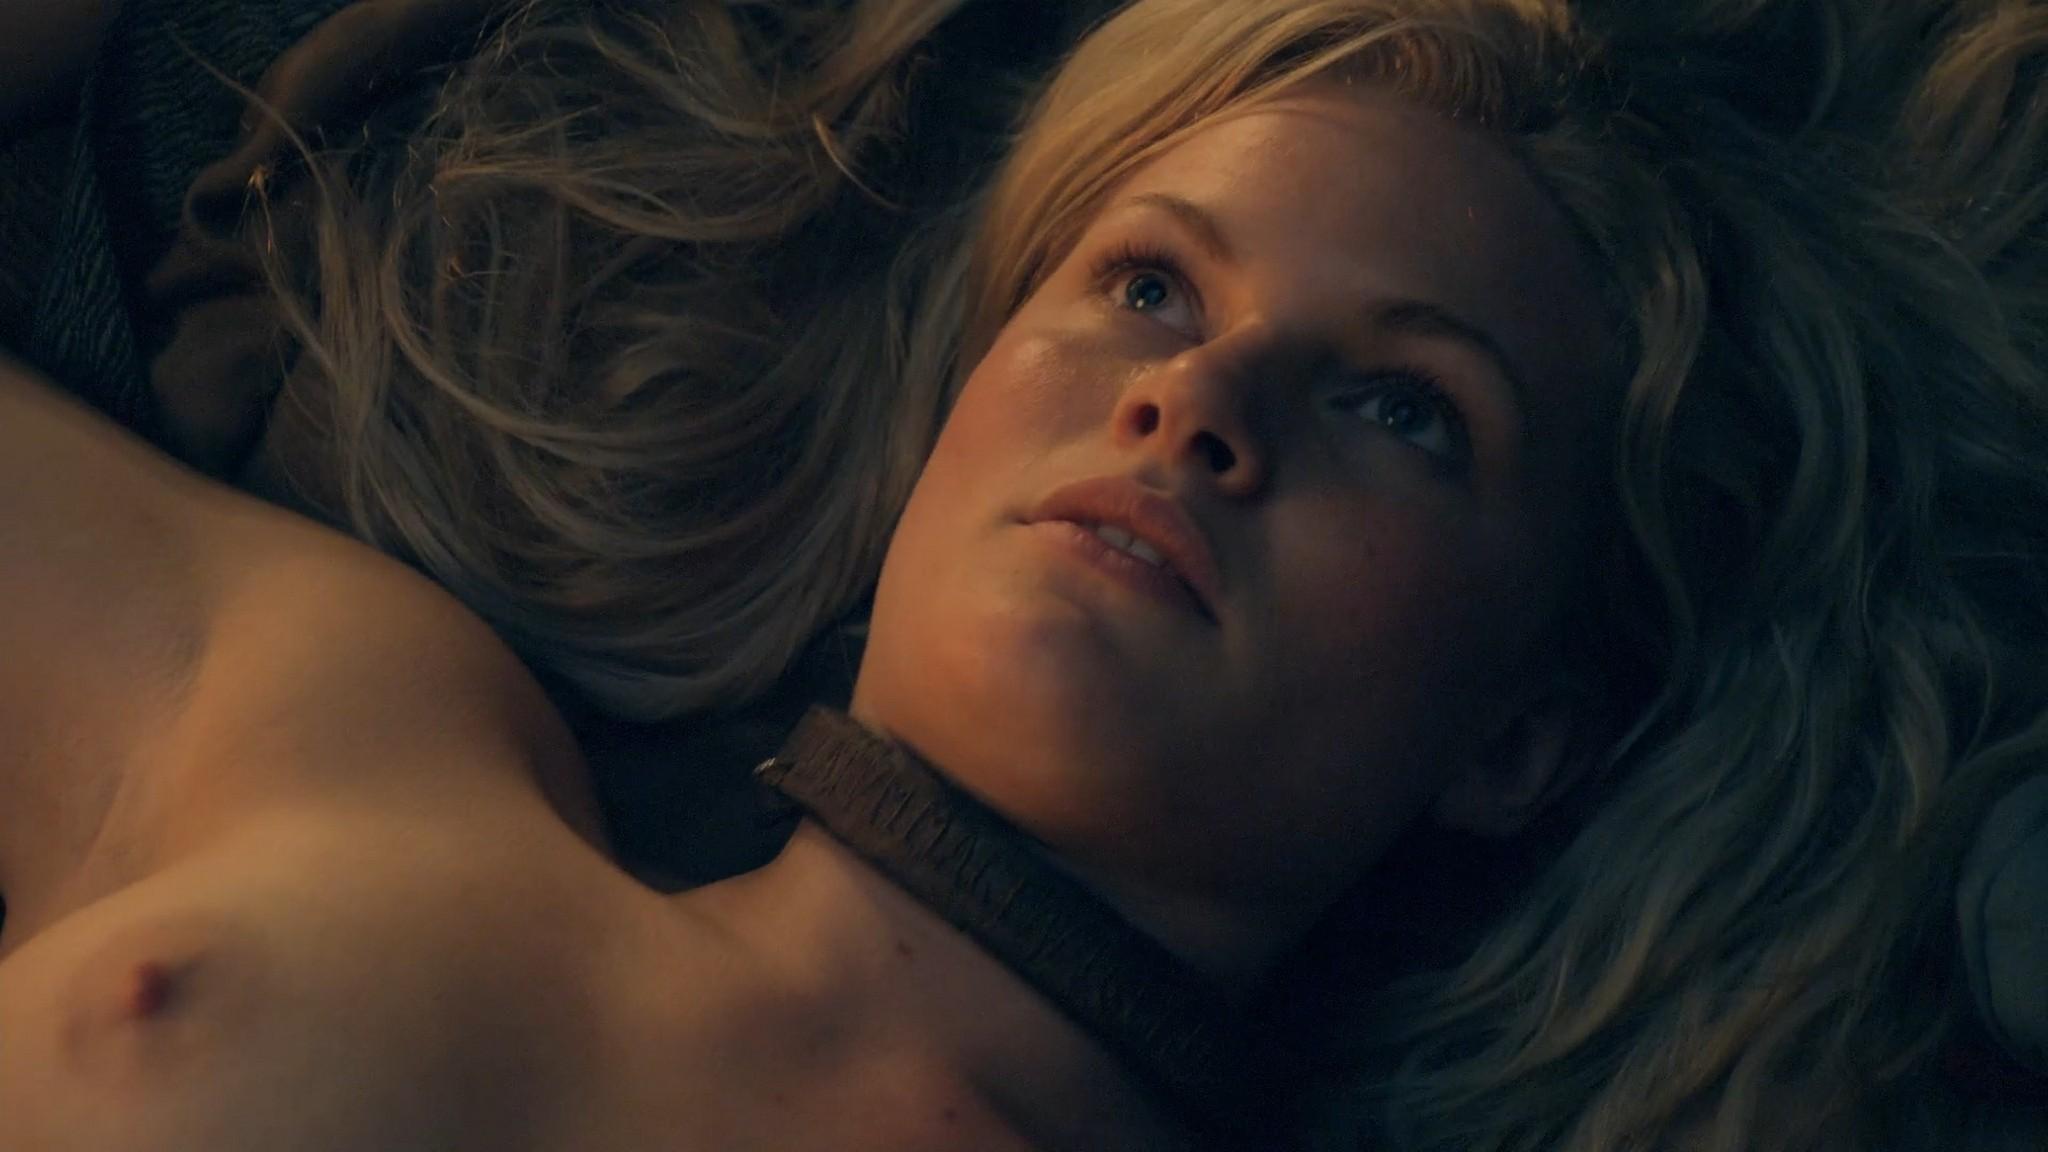 Viva Bianca nude Katrina Law, Bonnie Sveen all nude -Spartacus - Vengeance (2012) e2 1080p (15)